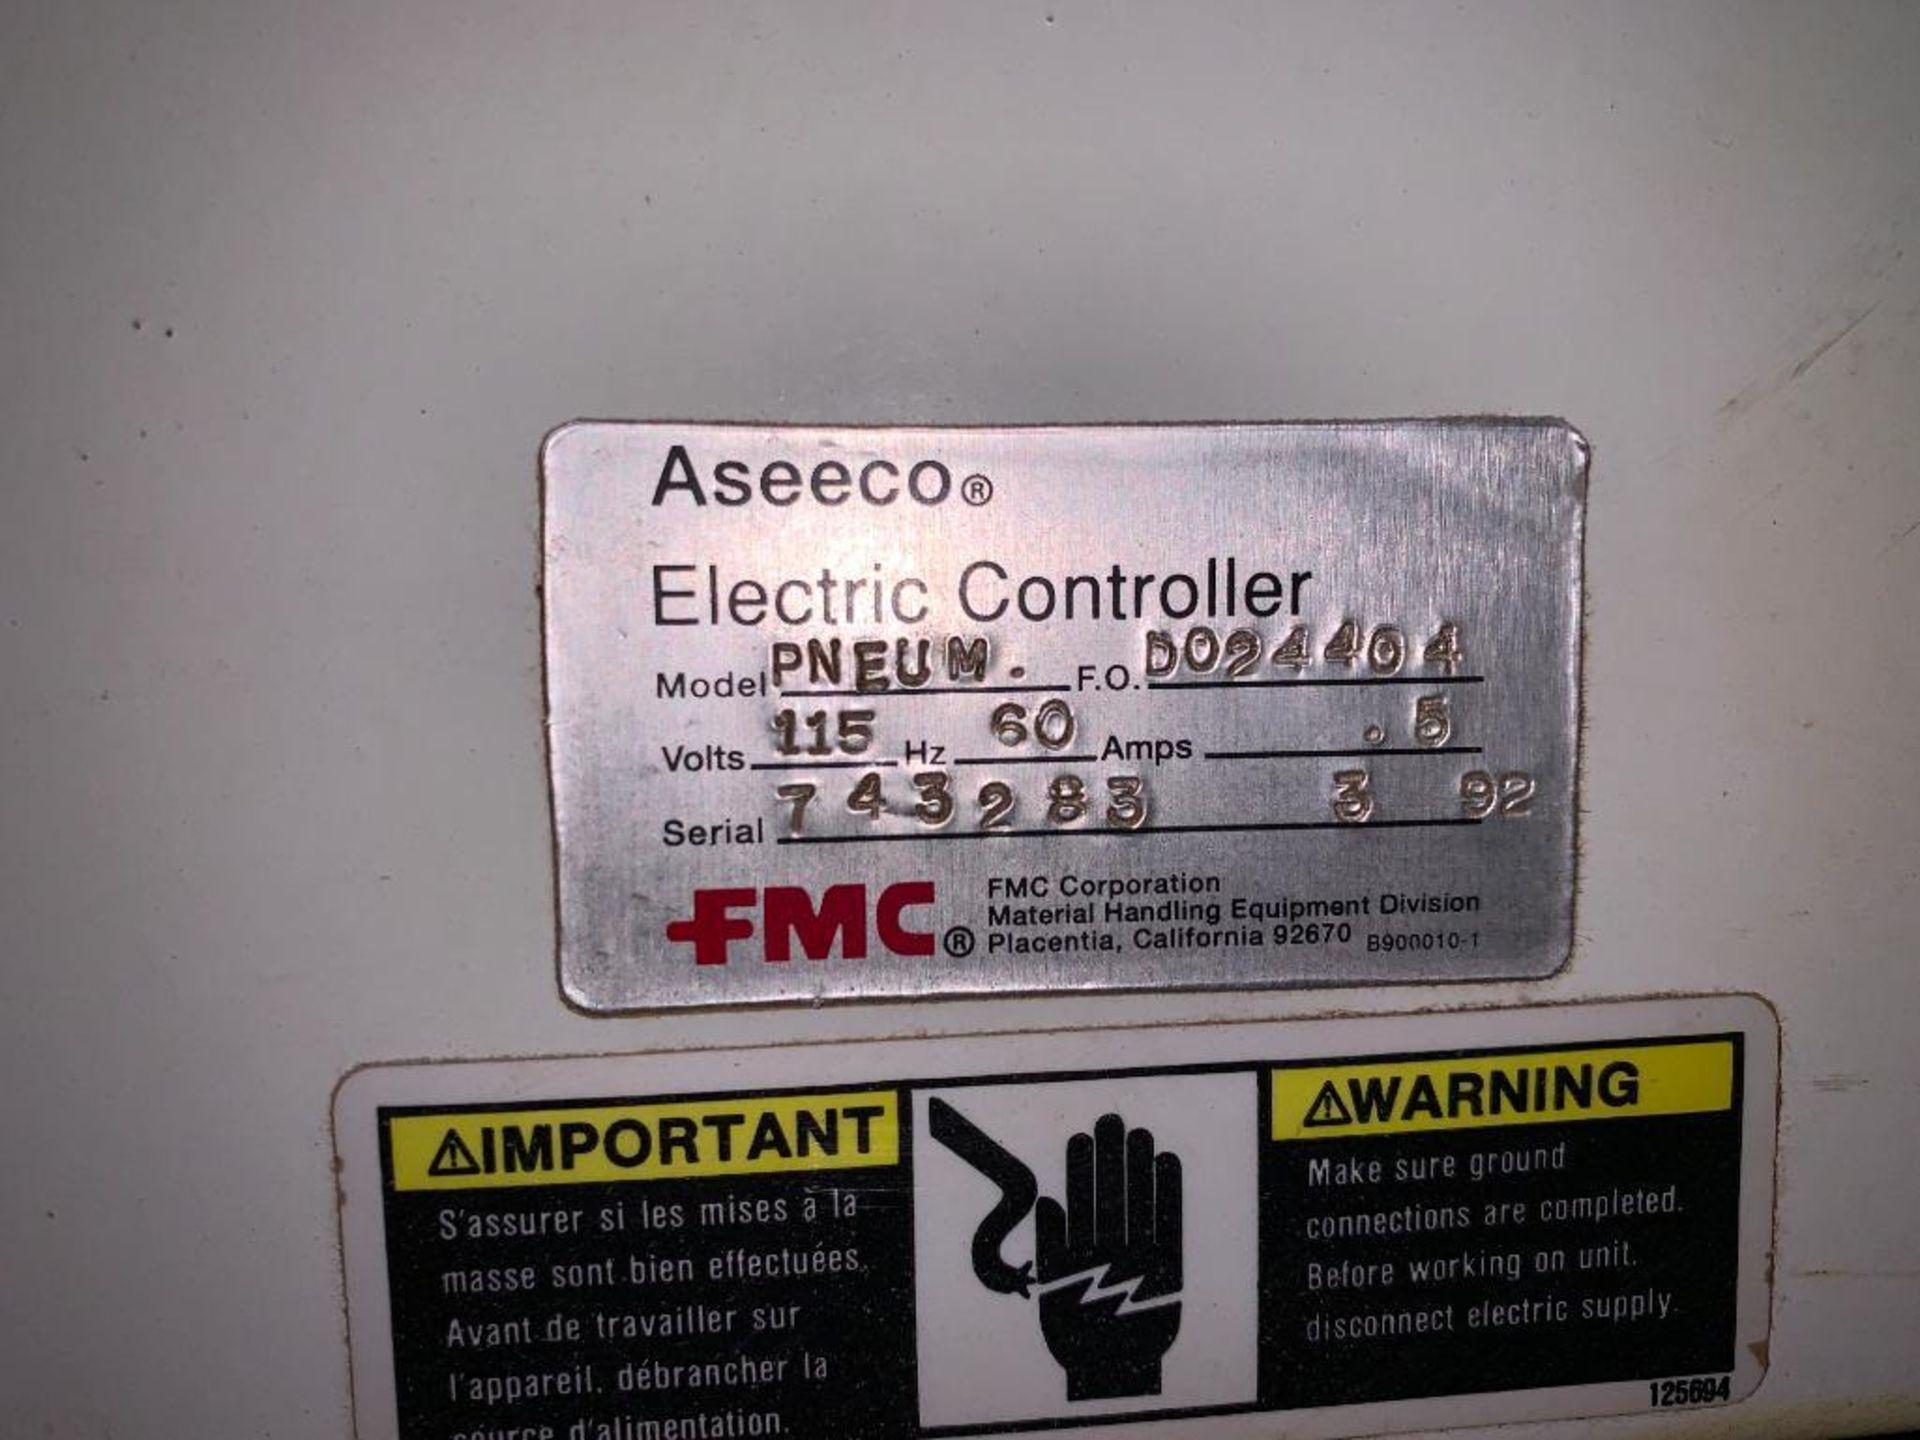 Aseeco mild steel cone bottom bulk storage bin - Image 22 of 25